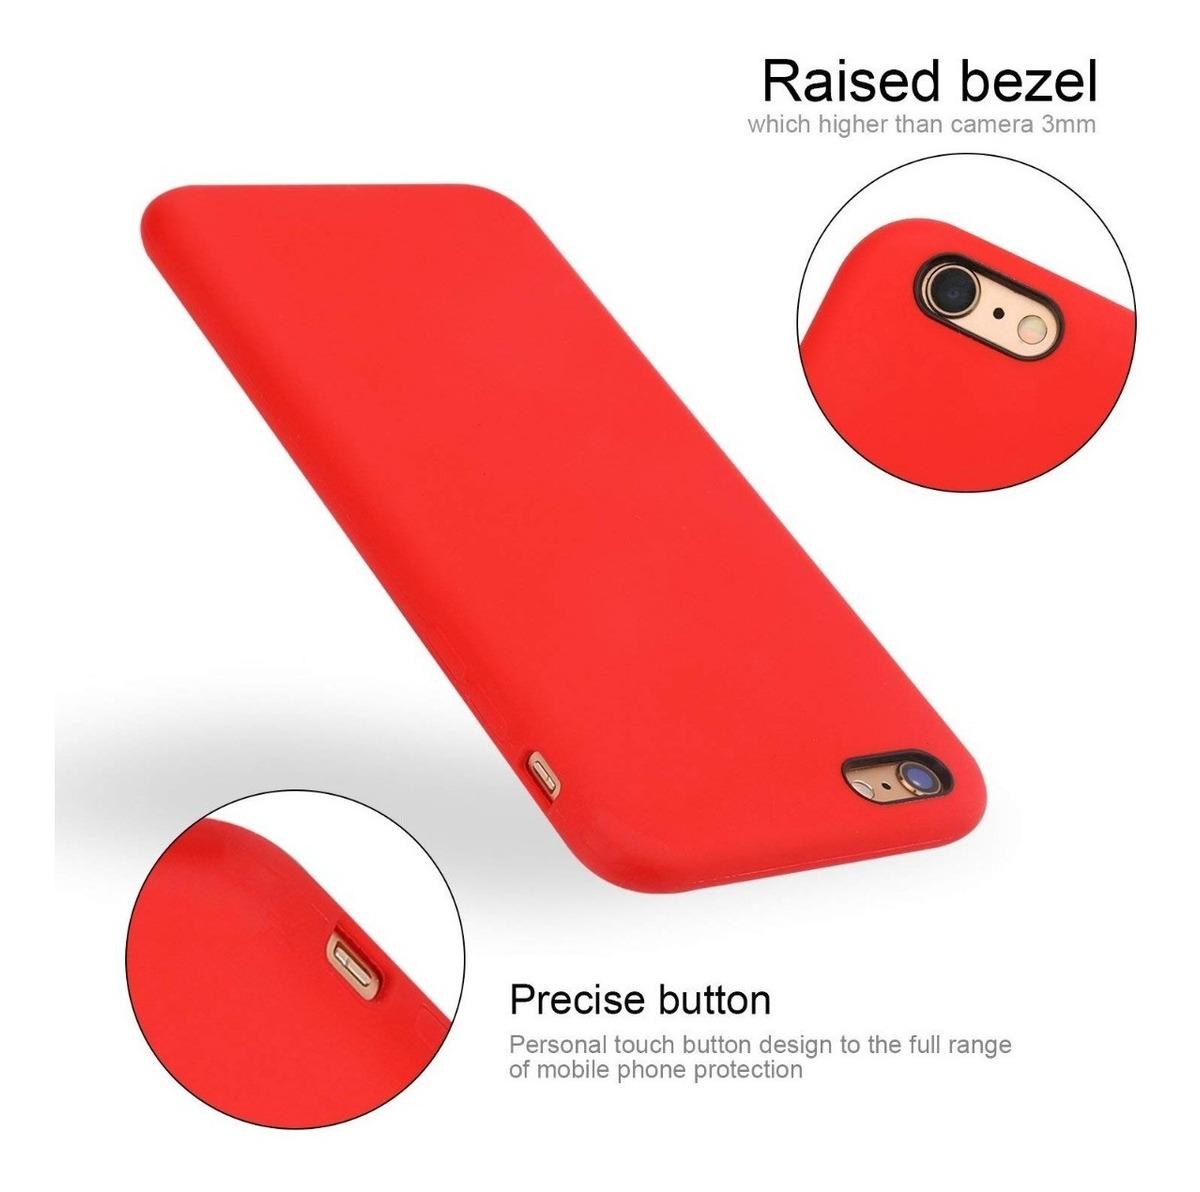 Funda Silicona Soft Case Gamuza iPhone 6 6s 7 8 Plus X Xs Tienda